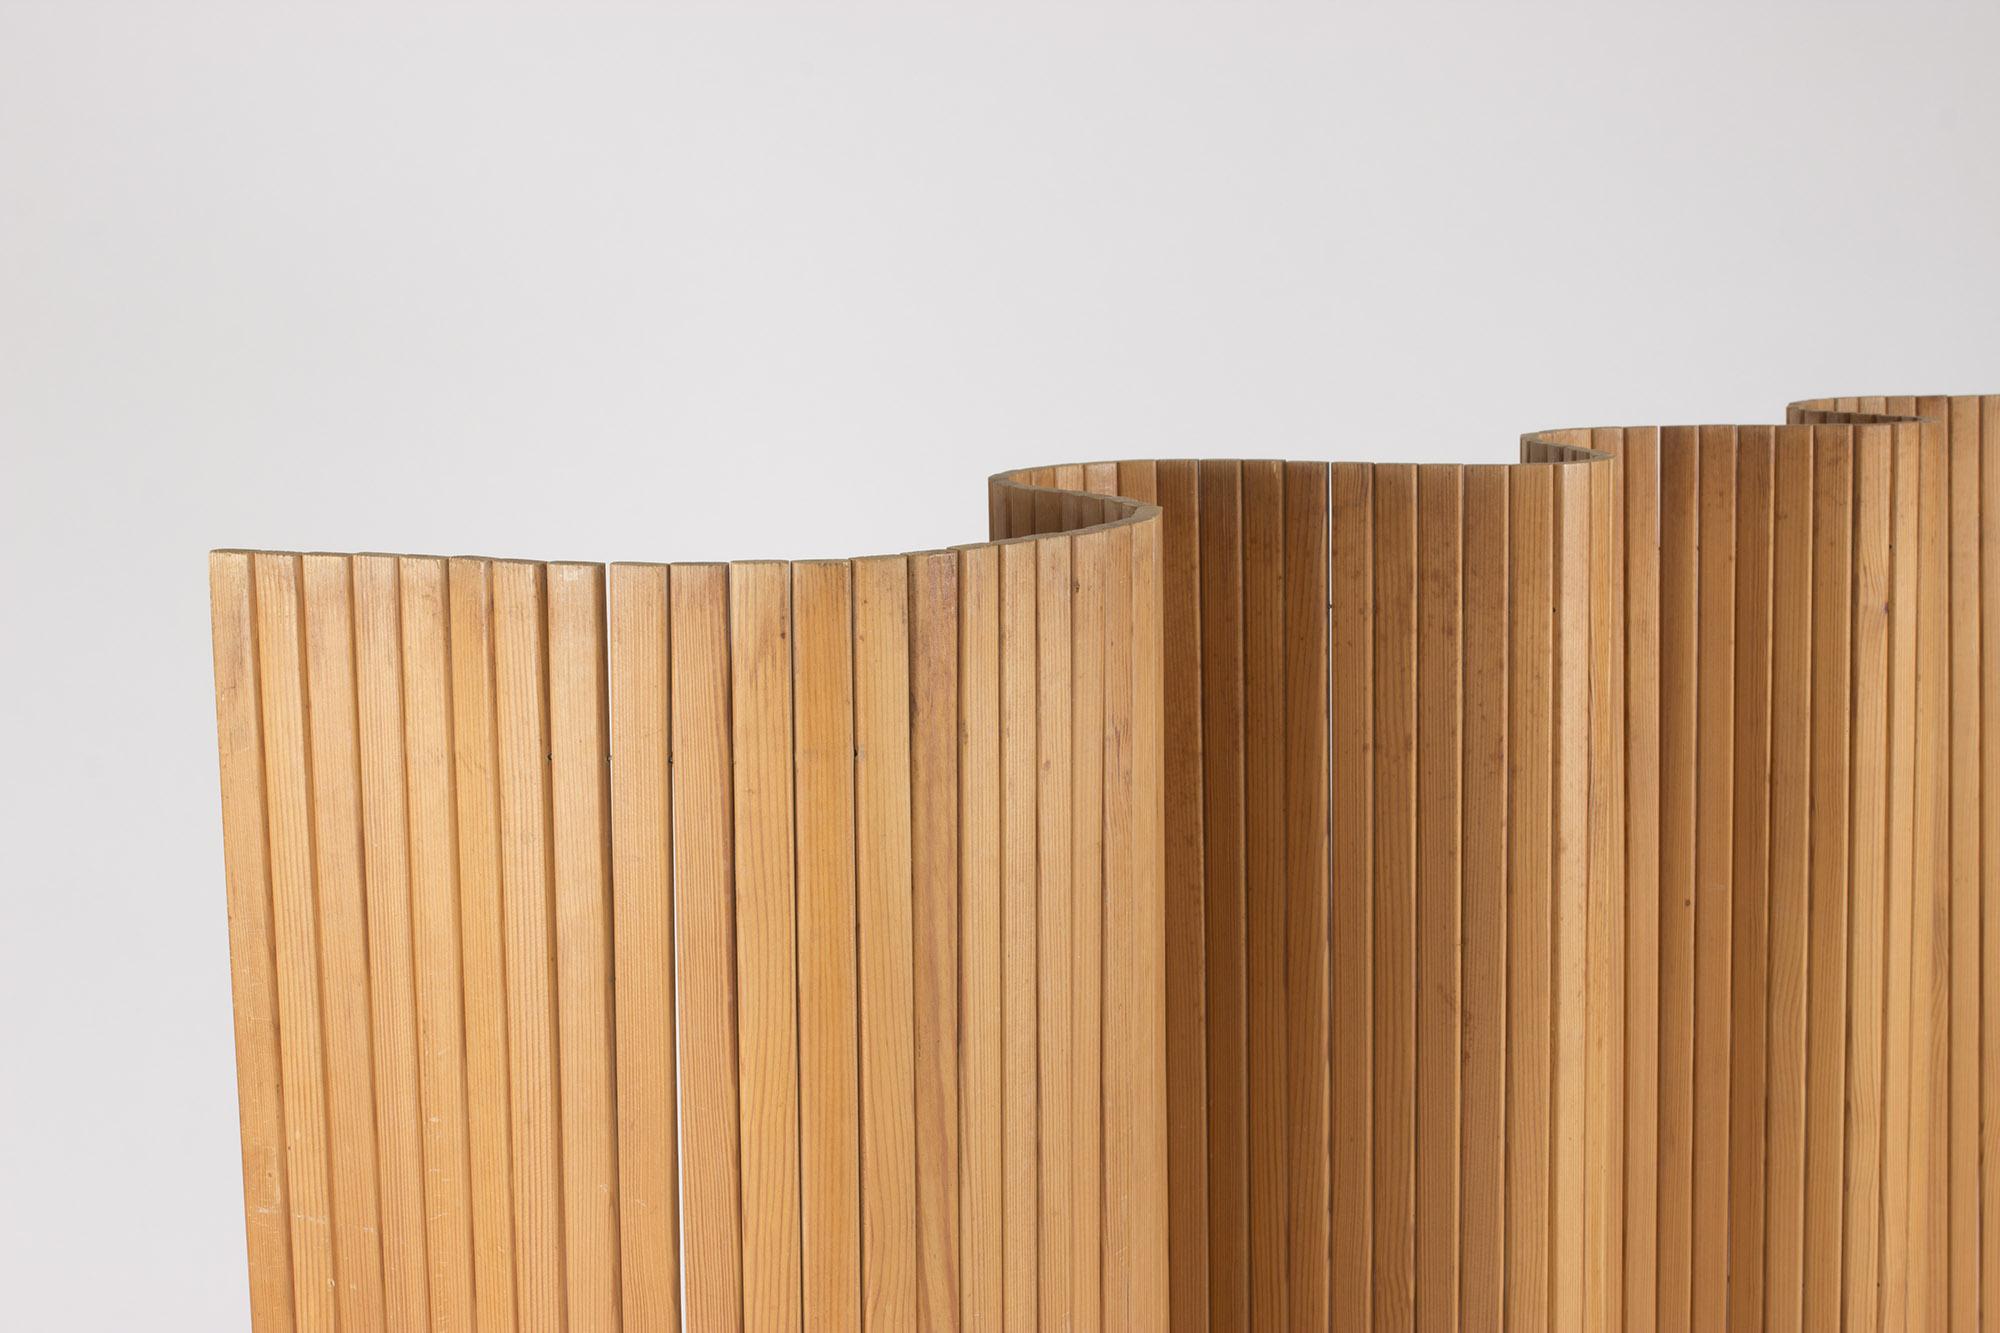 Pine Wood Room Divider By Alvar Aalto Vintage Mid